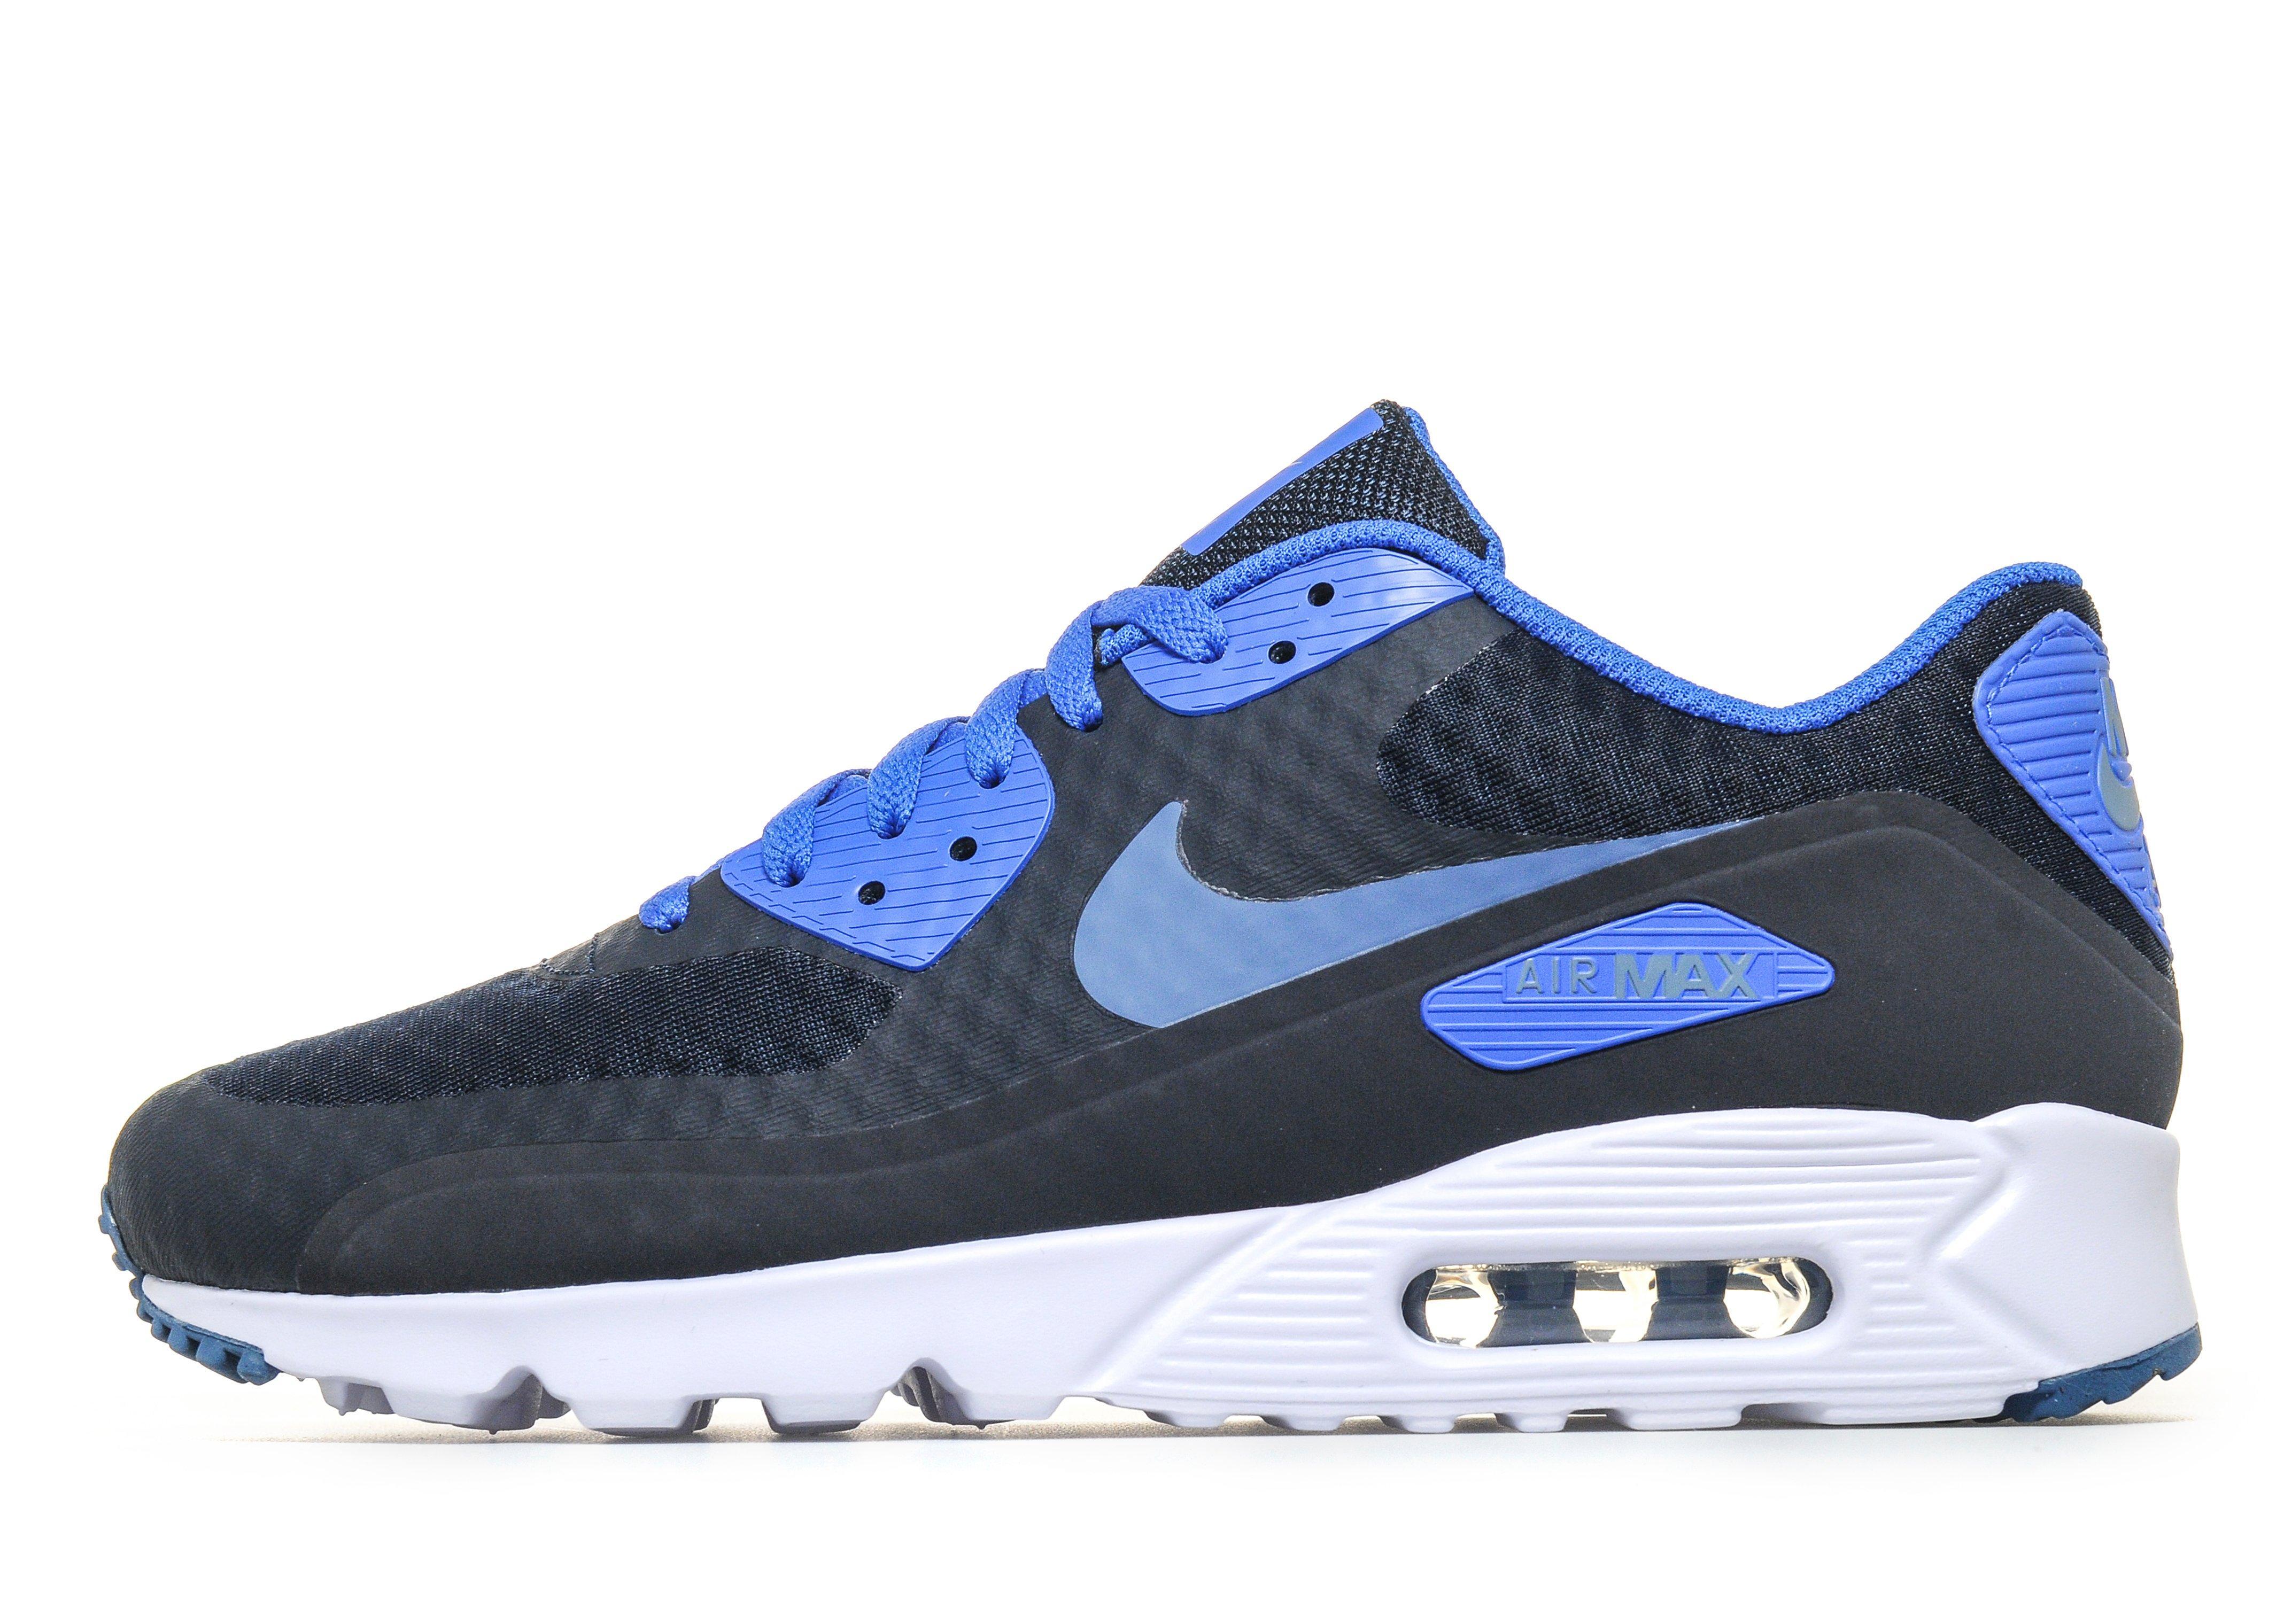 blue and white air max 90